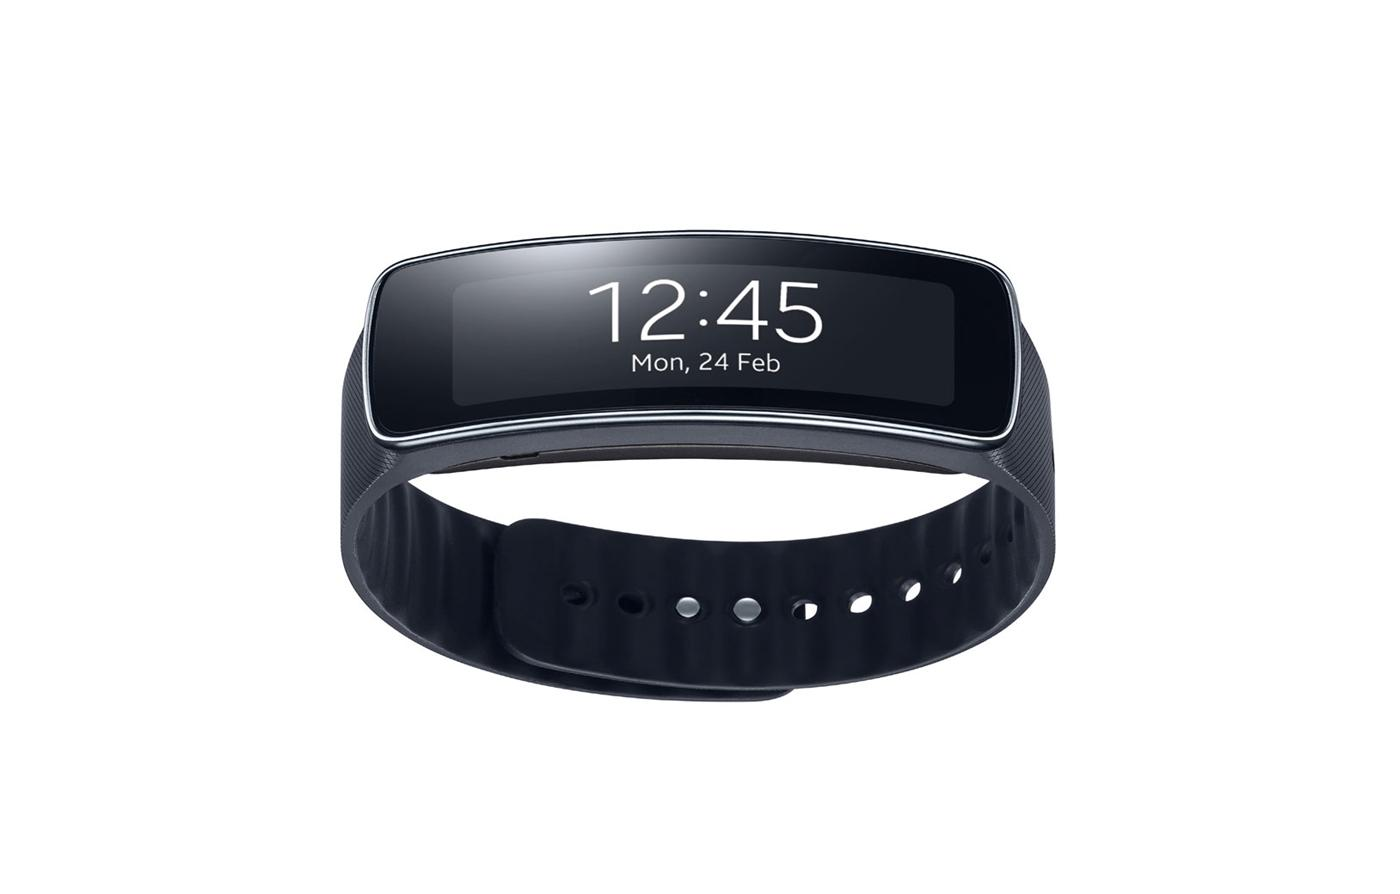 Fitur Samsung Gear Iconx 2018 Garansi Resmi Sein Dan Harga Terkini Galaxy A8 Hitam 3